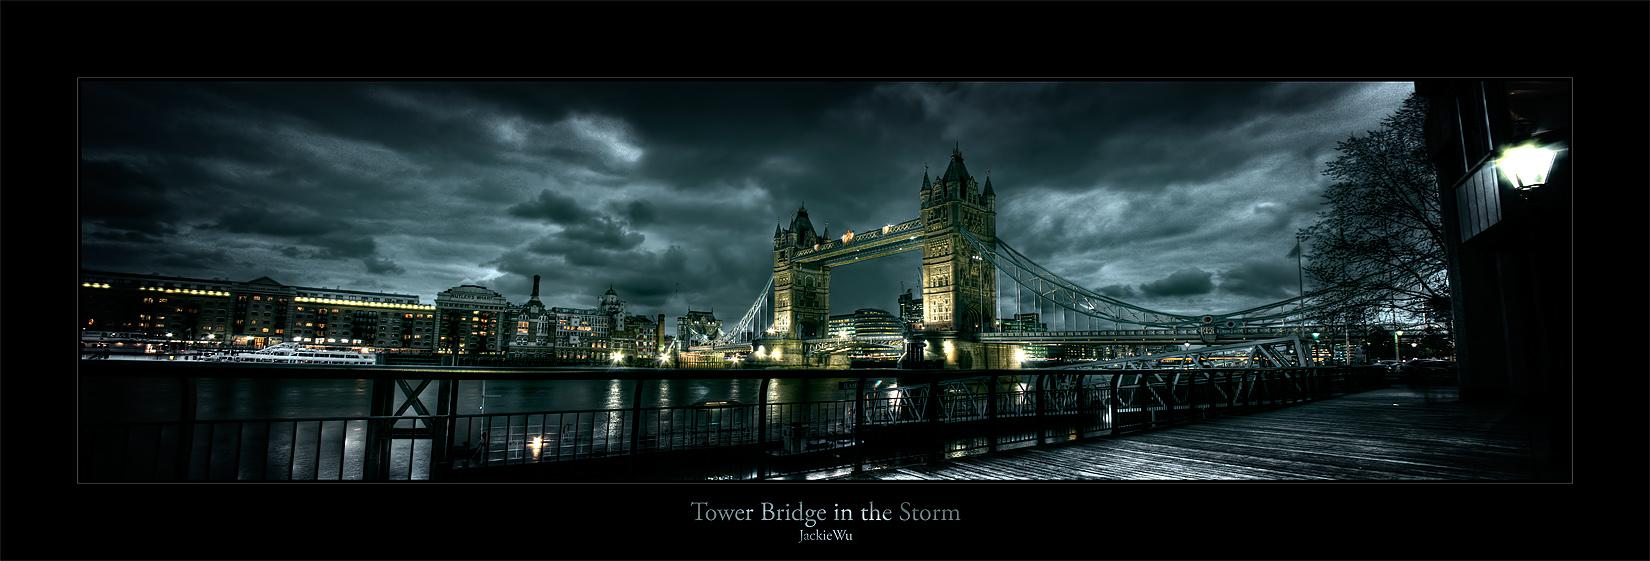 Tower Bridge in the Storm